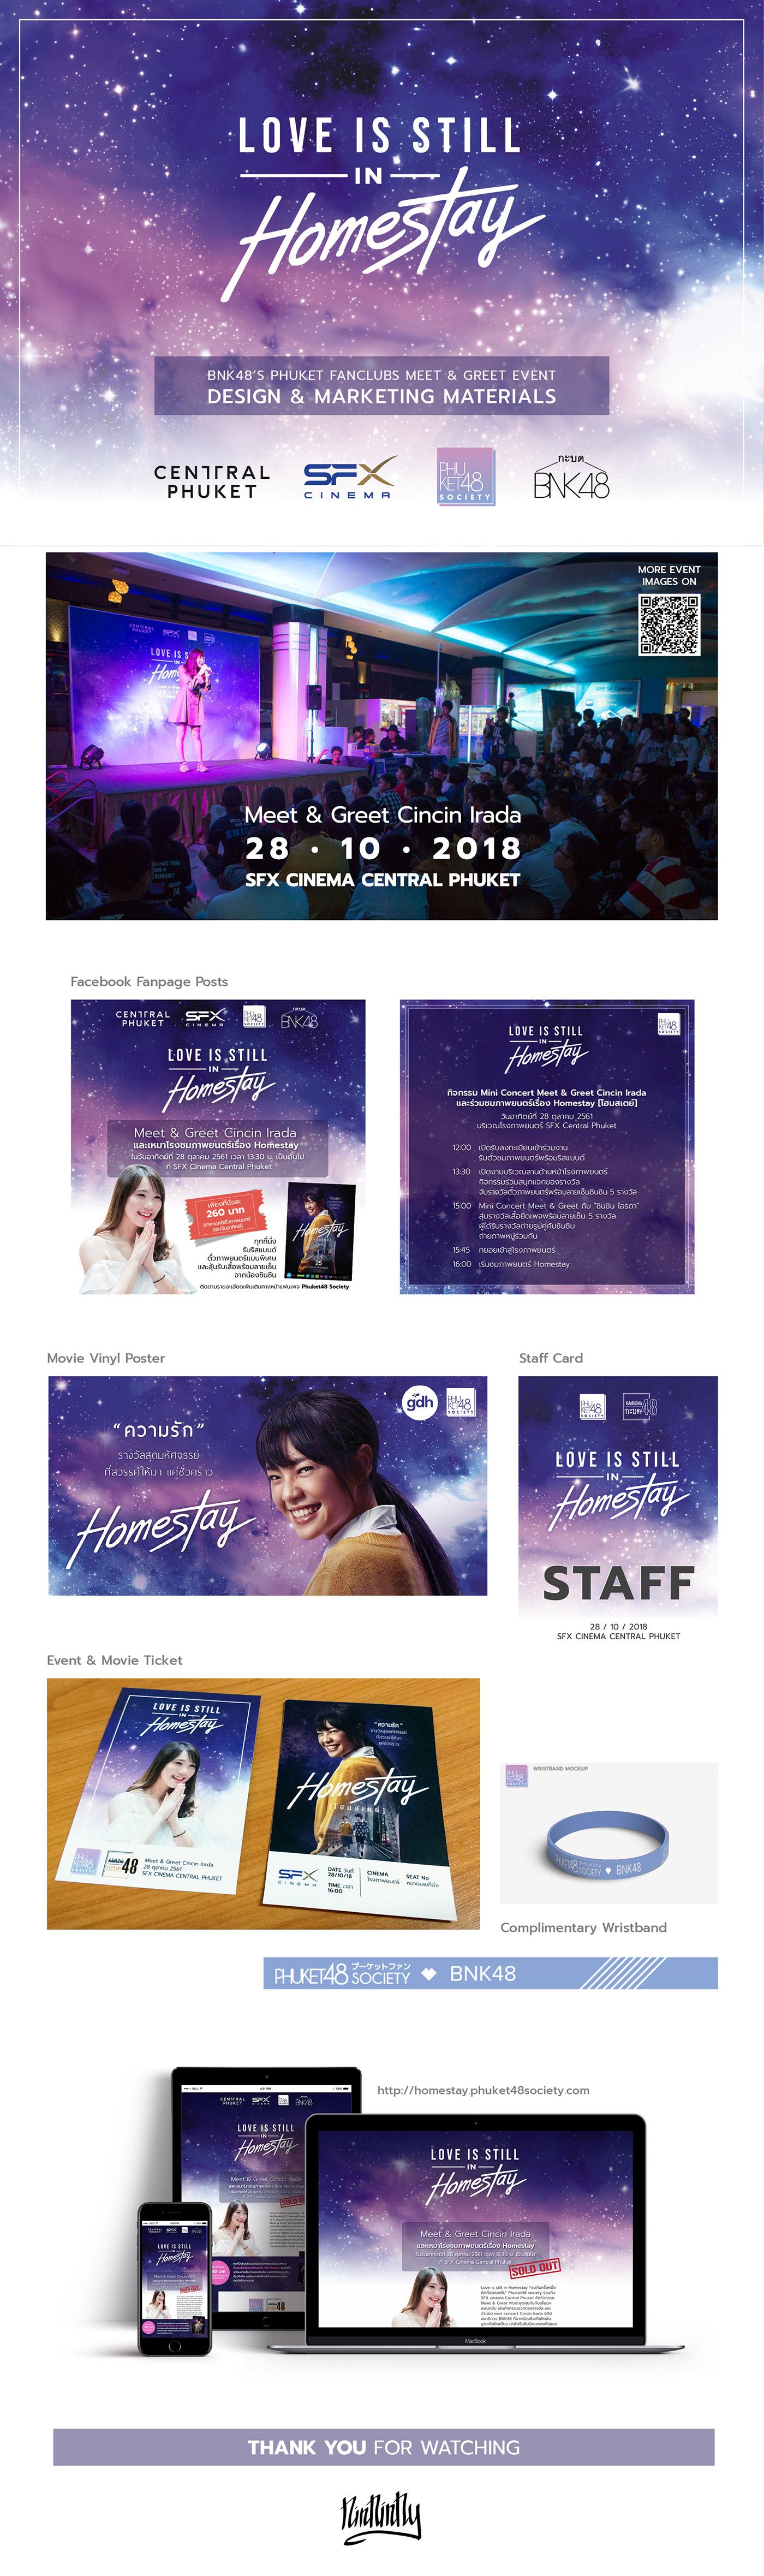 phuket48society bnk48 fanclub Event design materials